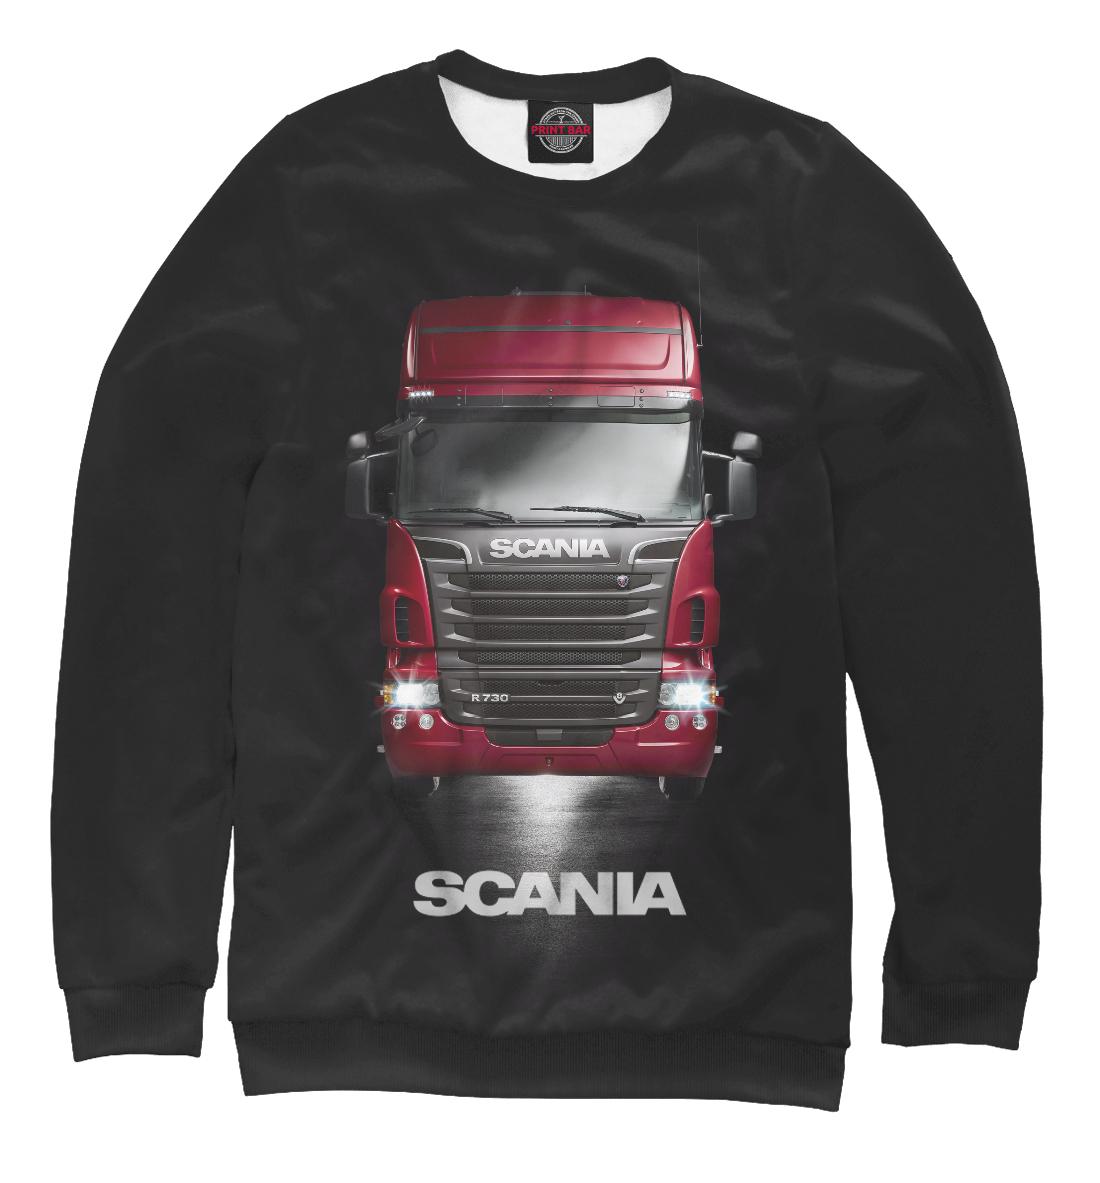 Купить Scania, Printbar, Свитшоты, GRZ-196237-swi-2